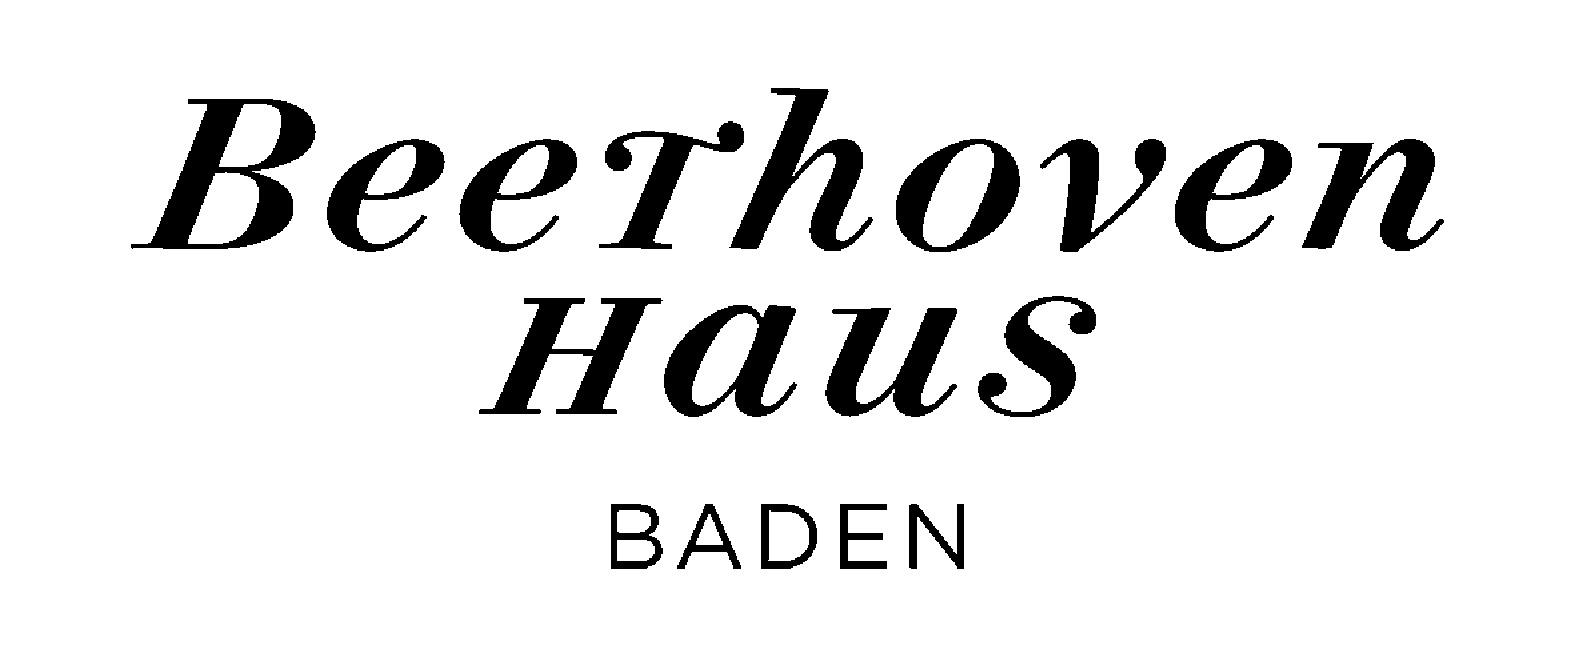 Beethovenhaus Baden